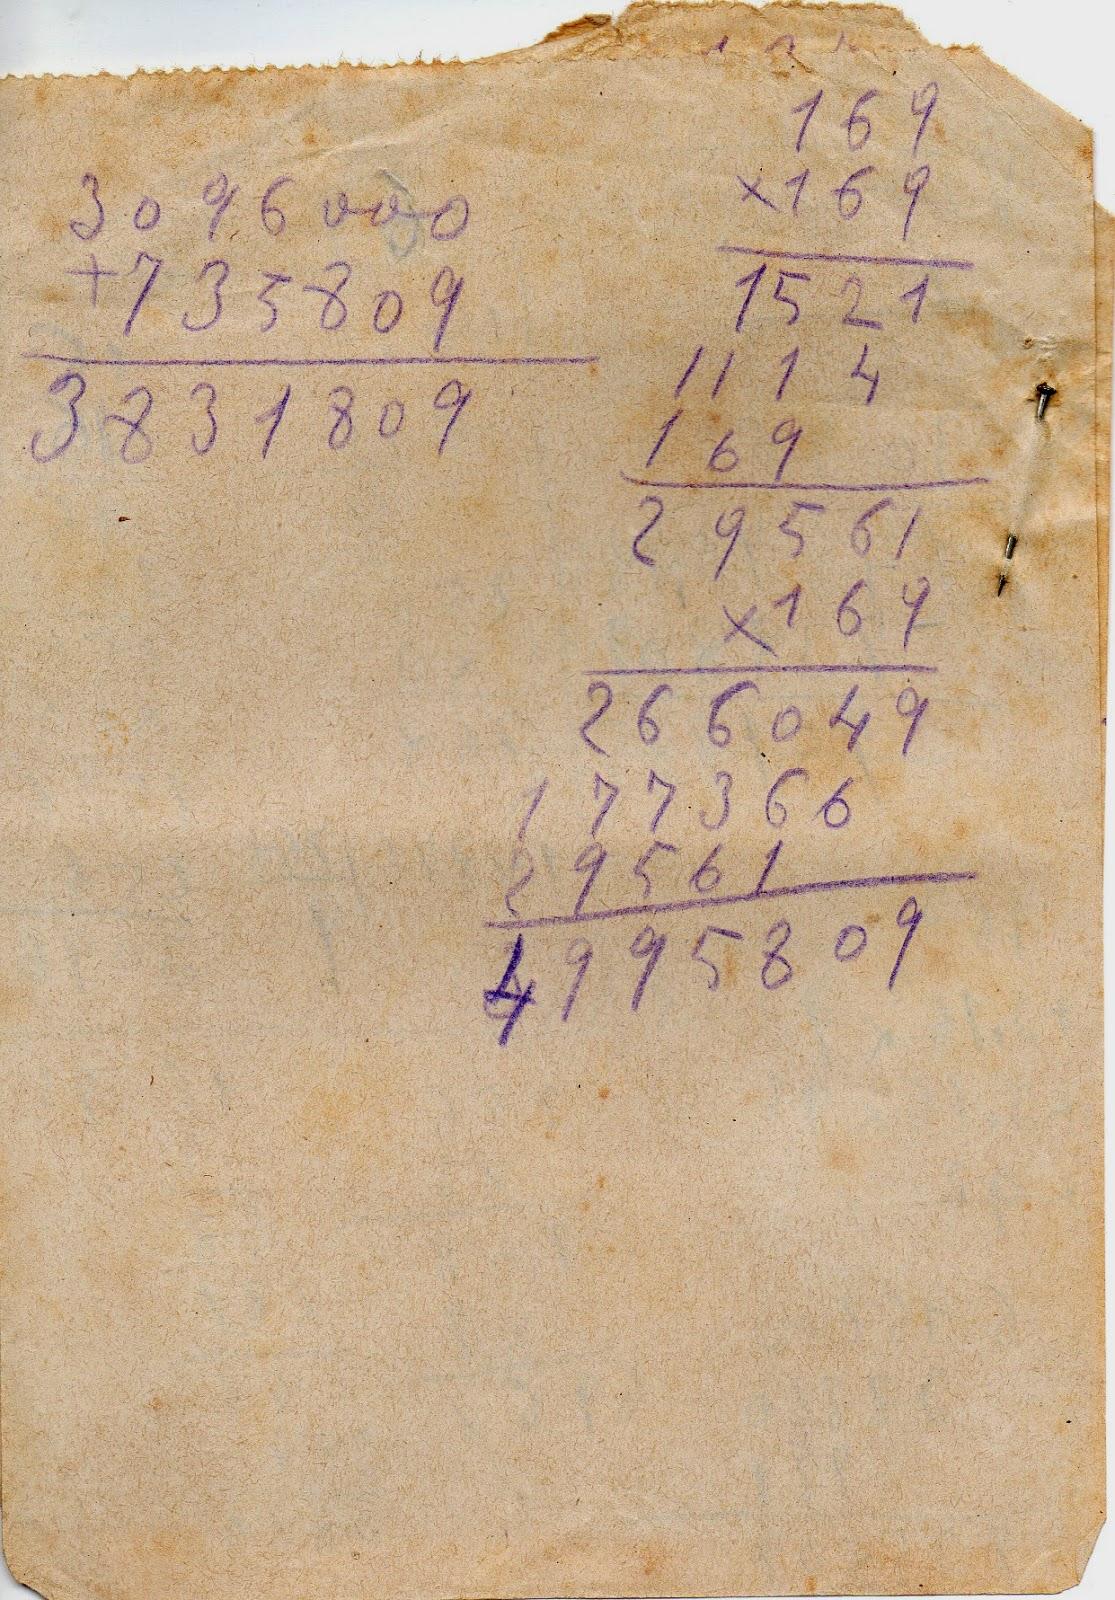 Melitina Álvaro Blázquez - Material escolar - 1933-1940 - Cuentas con aguja